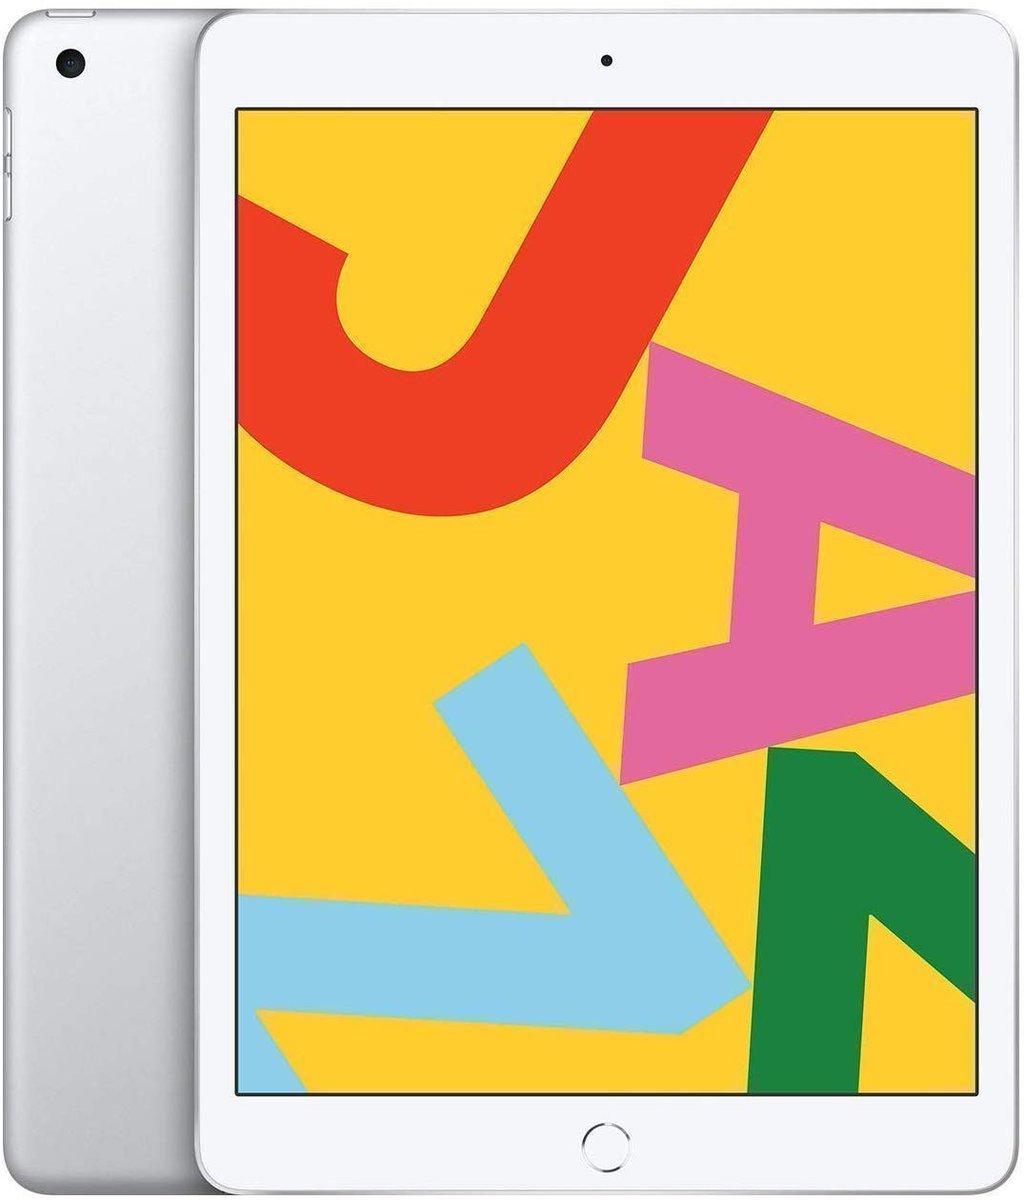 Grab the NEW iPad for $249! buff.ly/2vMTgPA